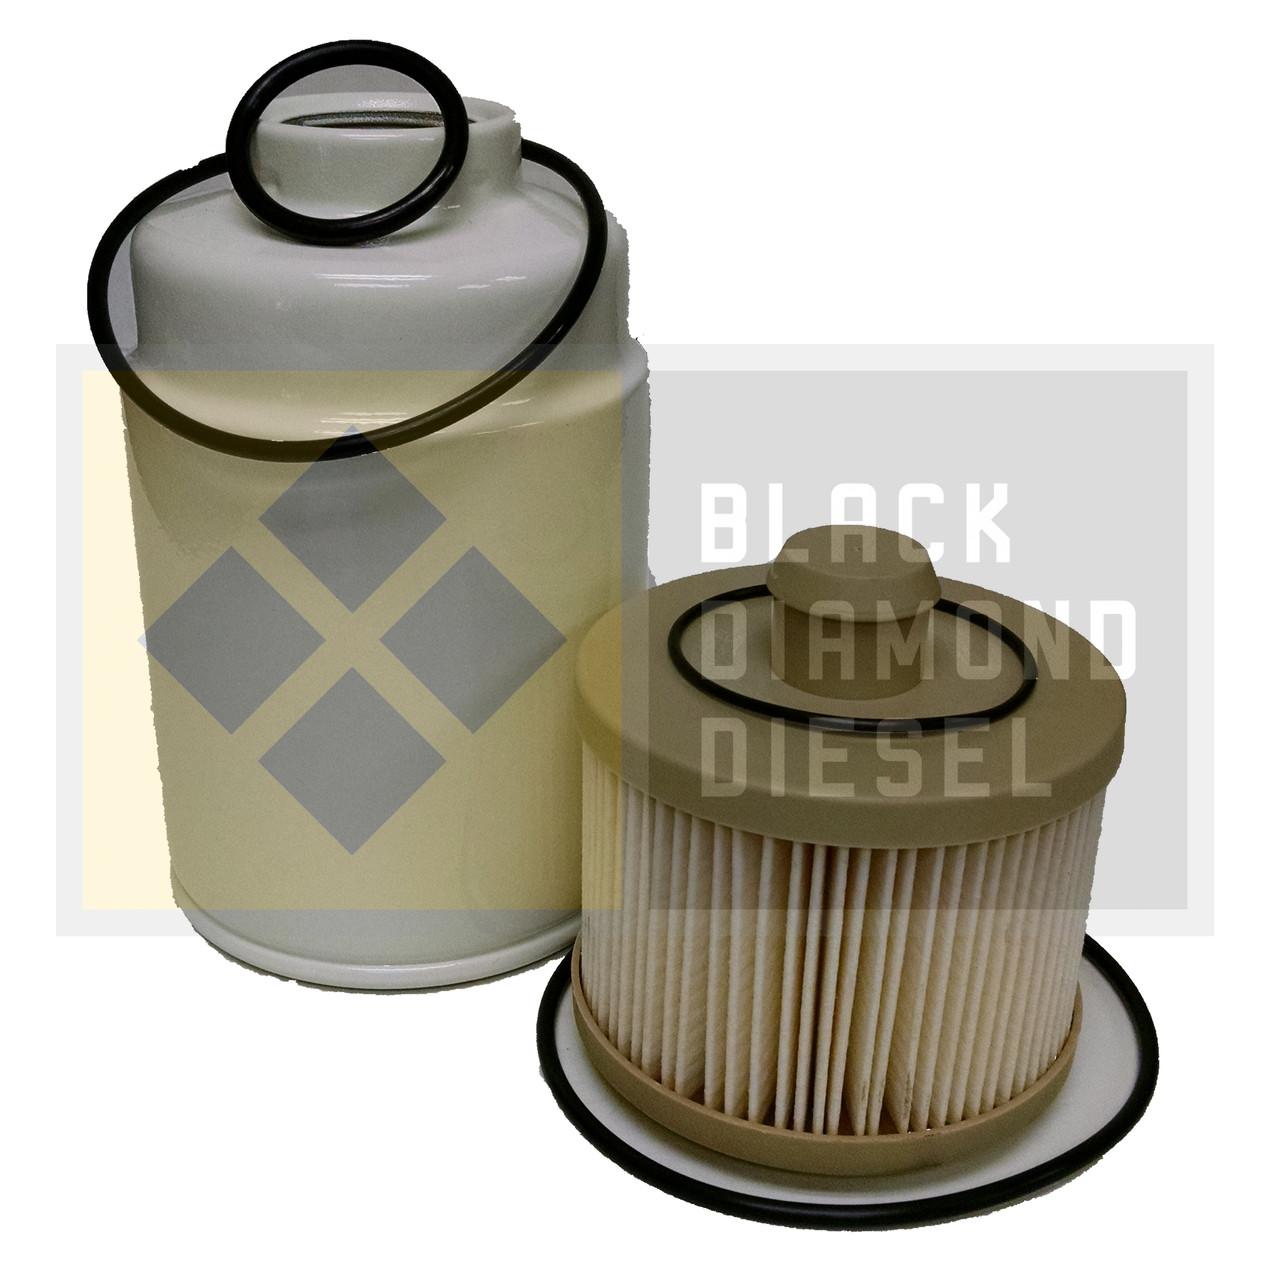 small resolution of prime guard fuel filter fits 2006 2012 gm 6 6 duramax diesel van bdspdf75888